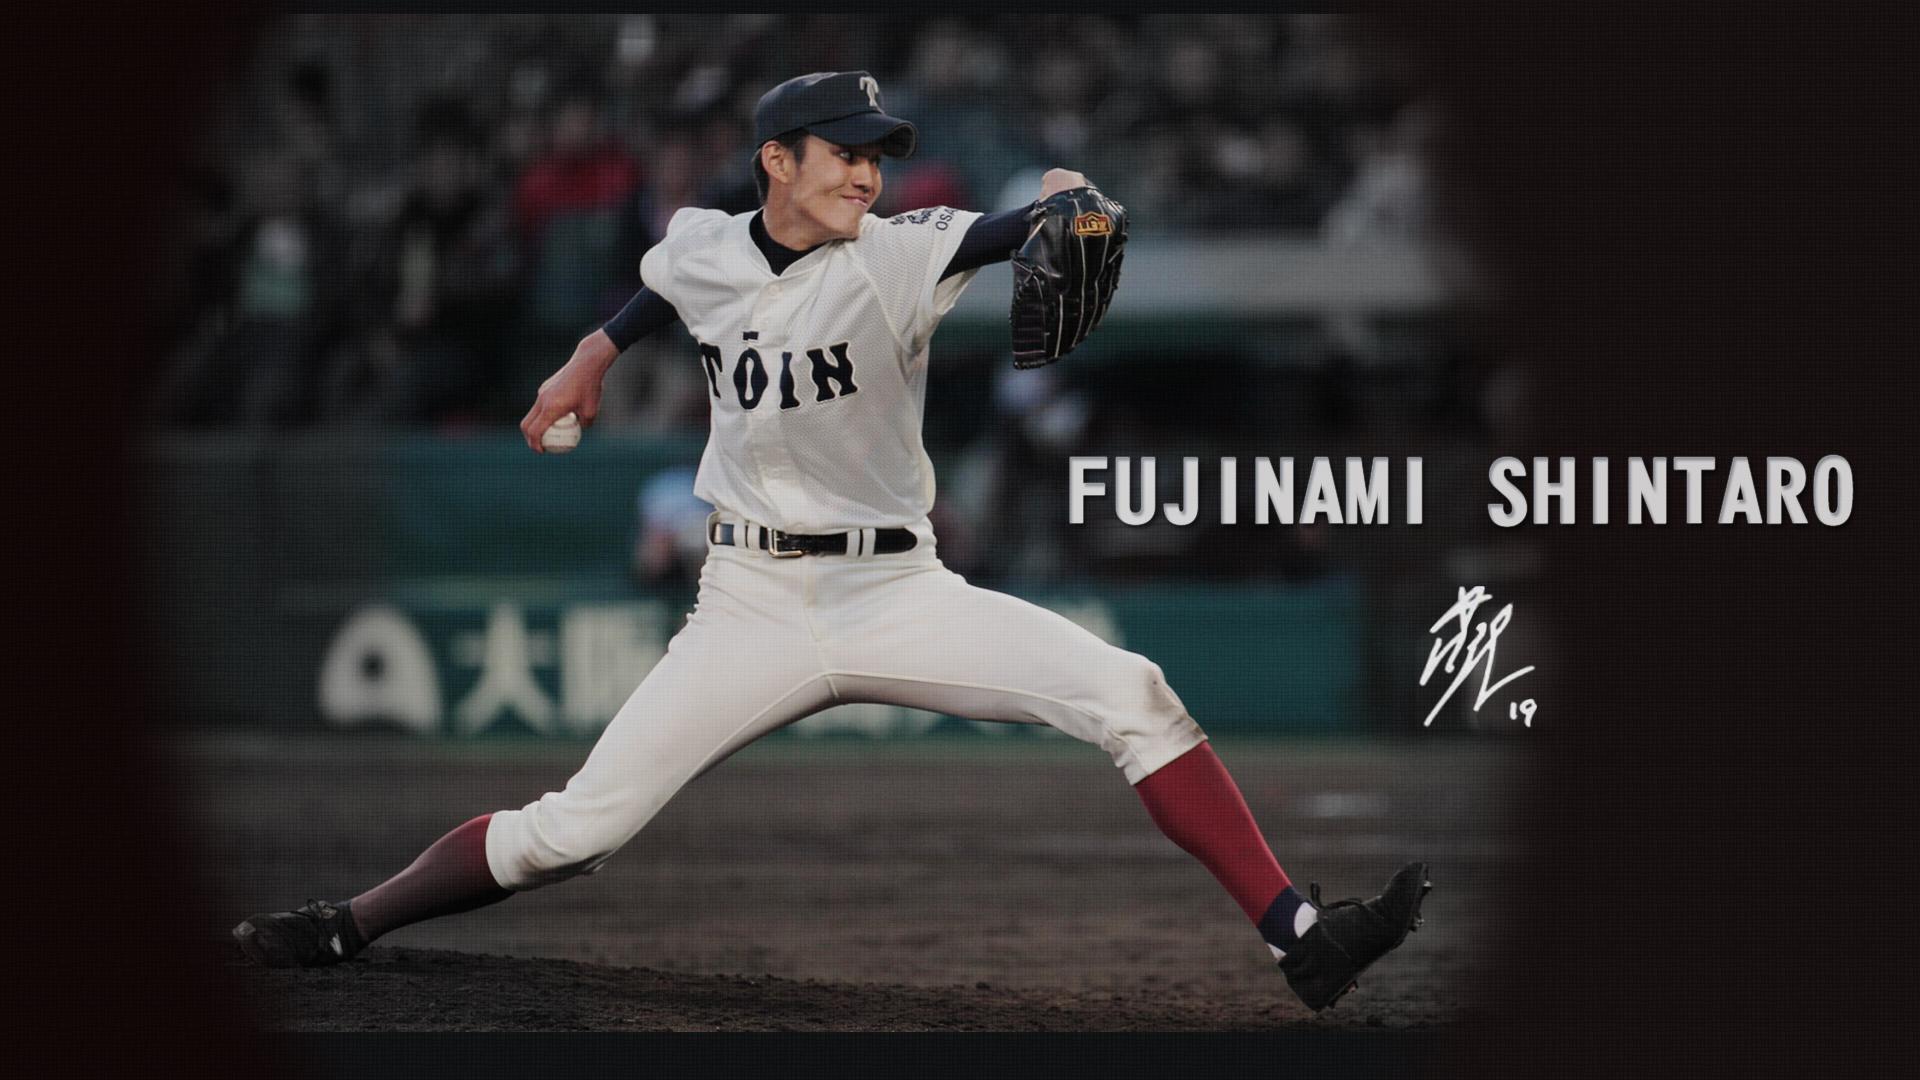 fujinami rintaro hanshin tigers toin wallpaper